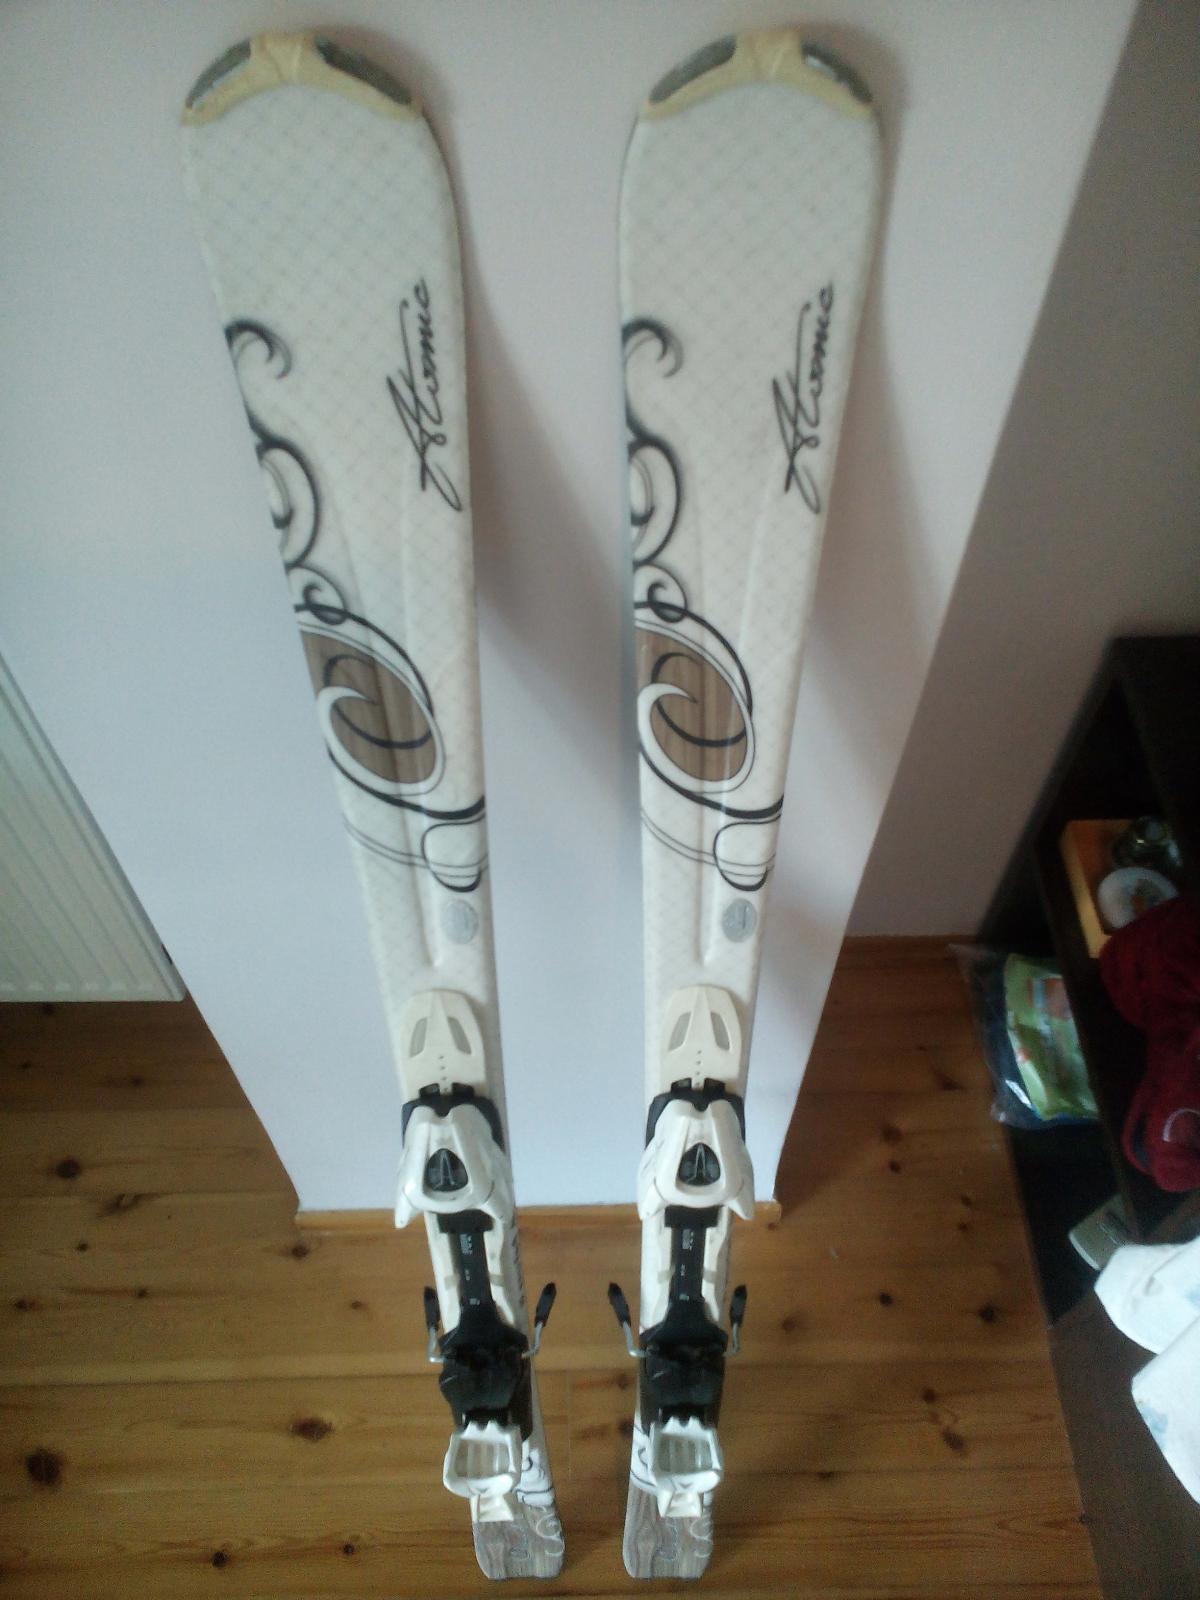 697925c316 Πωλουνται Ski Atomic Cloud 6  11 Με Μπότες Head Ezon 6.5 360 Women ...